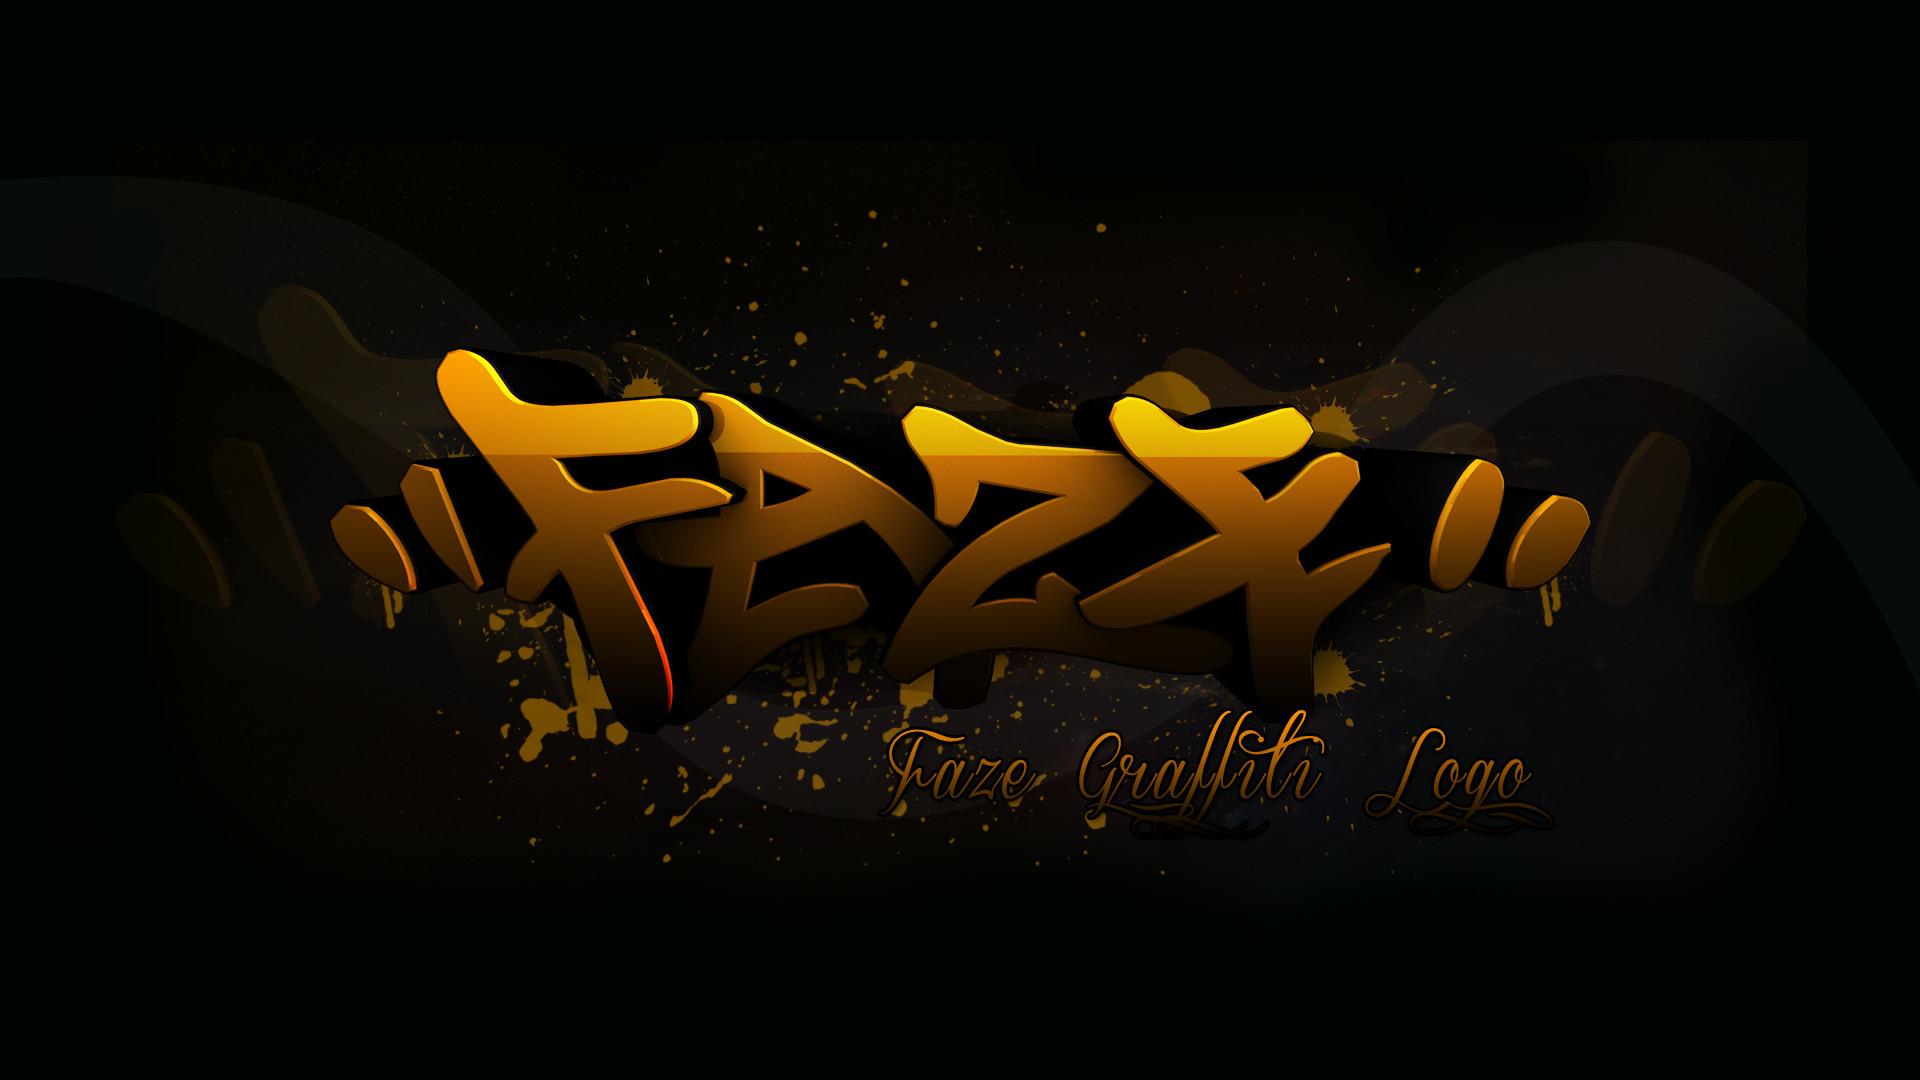 Res: 1920x1080, FaZe Graffiti Desktop Background by oohRetro FaZe Graffiti Desktop  Background by oohRetro